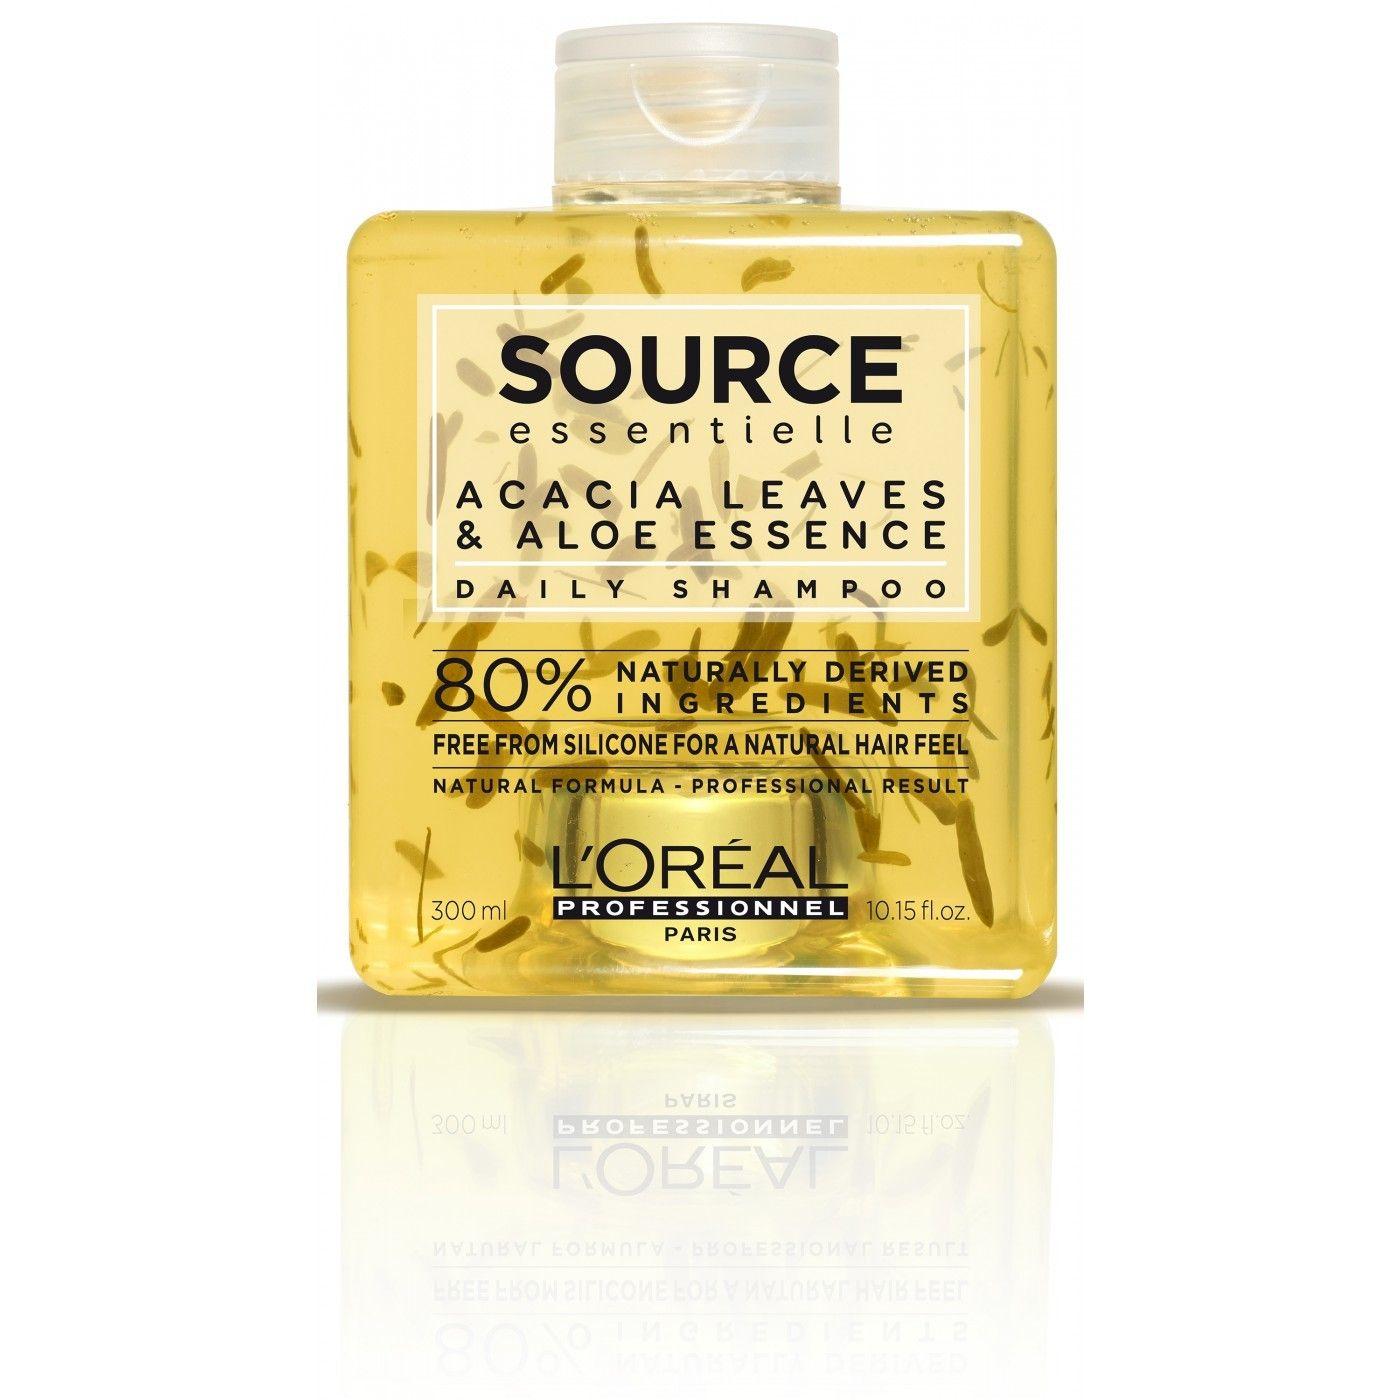 L Oréal Professionnel Source Essentielle Daily Shampoo (300ml) Φυσικό  Σαμπουάν Μαλλιών Daily για 2ce6f19ffb0